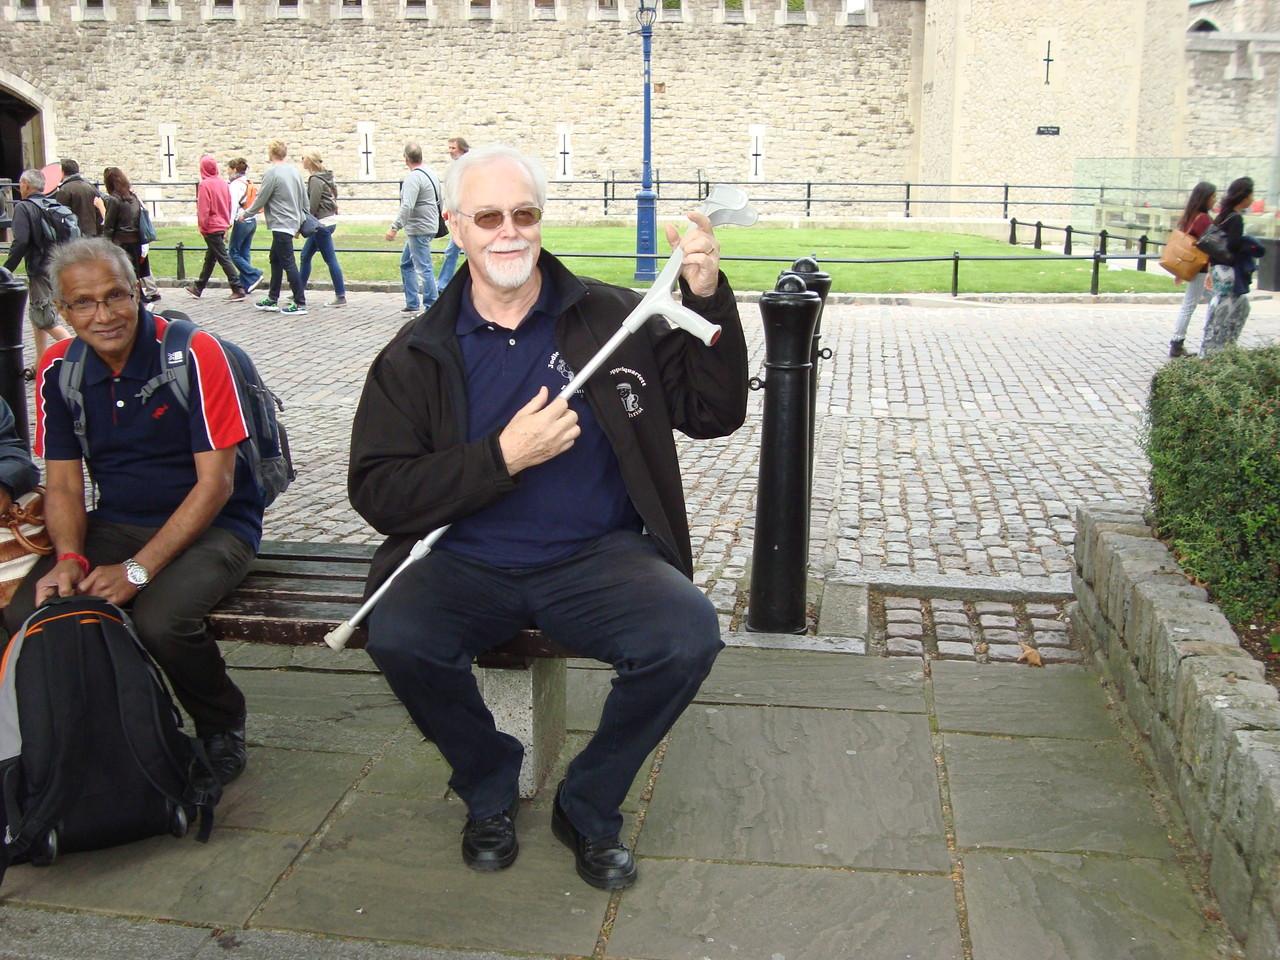 London, 1. Sept 2012